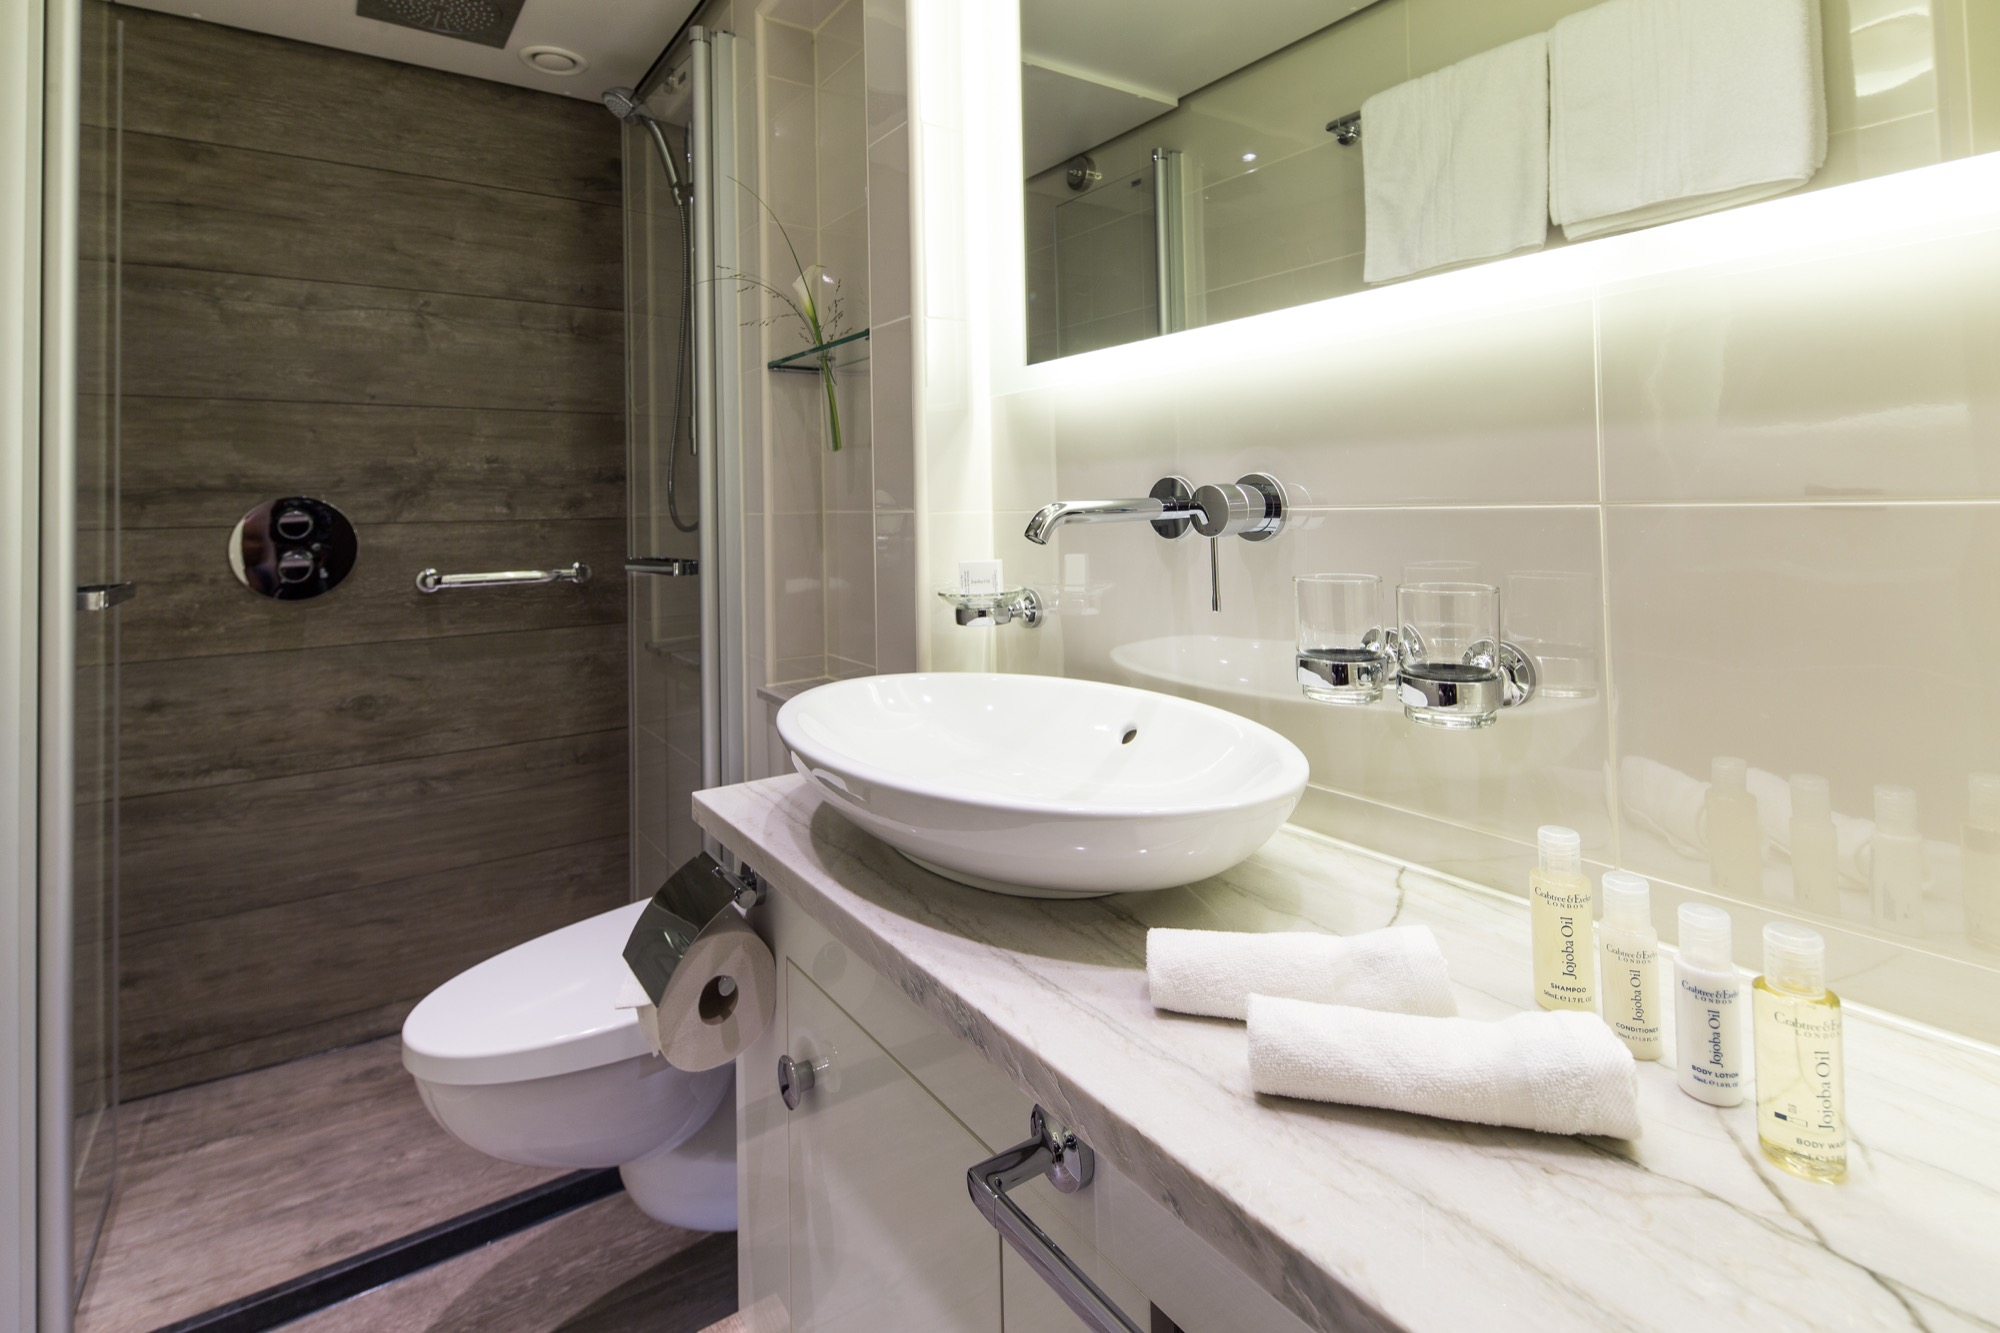 Riviera Travel Thomas Hardy Accommodation Suite Bathroom.jpg